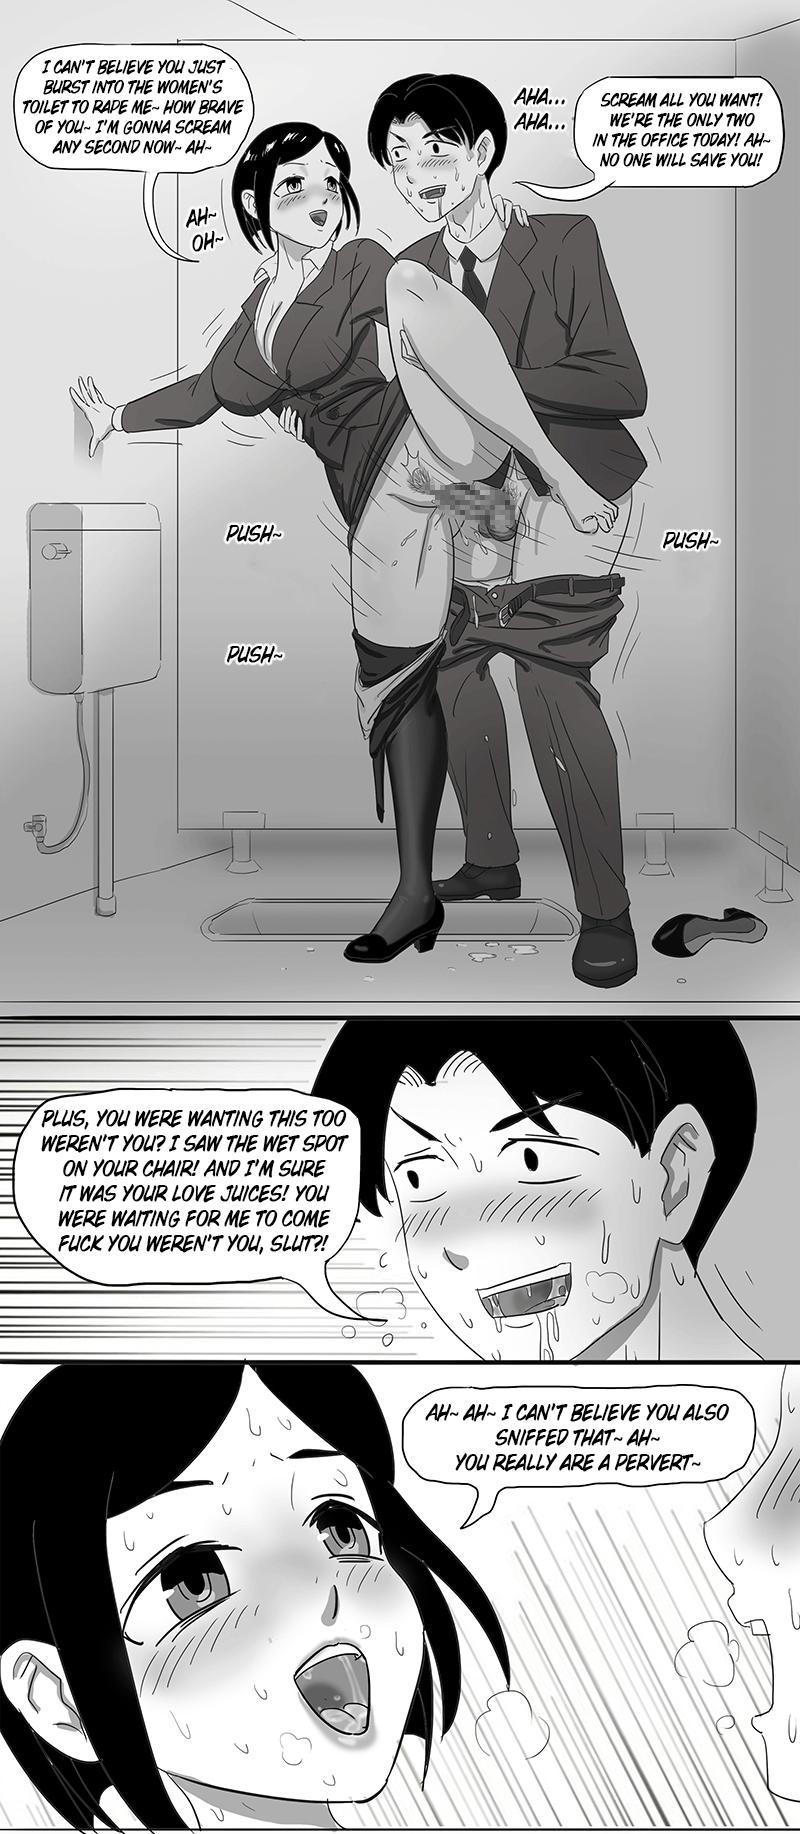 [skyzen] 寄生虫系列 [English] [xinsu] pg. 1-48 40